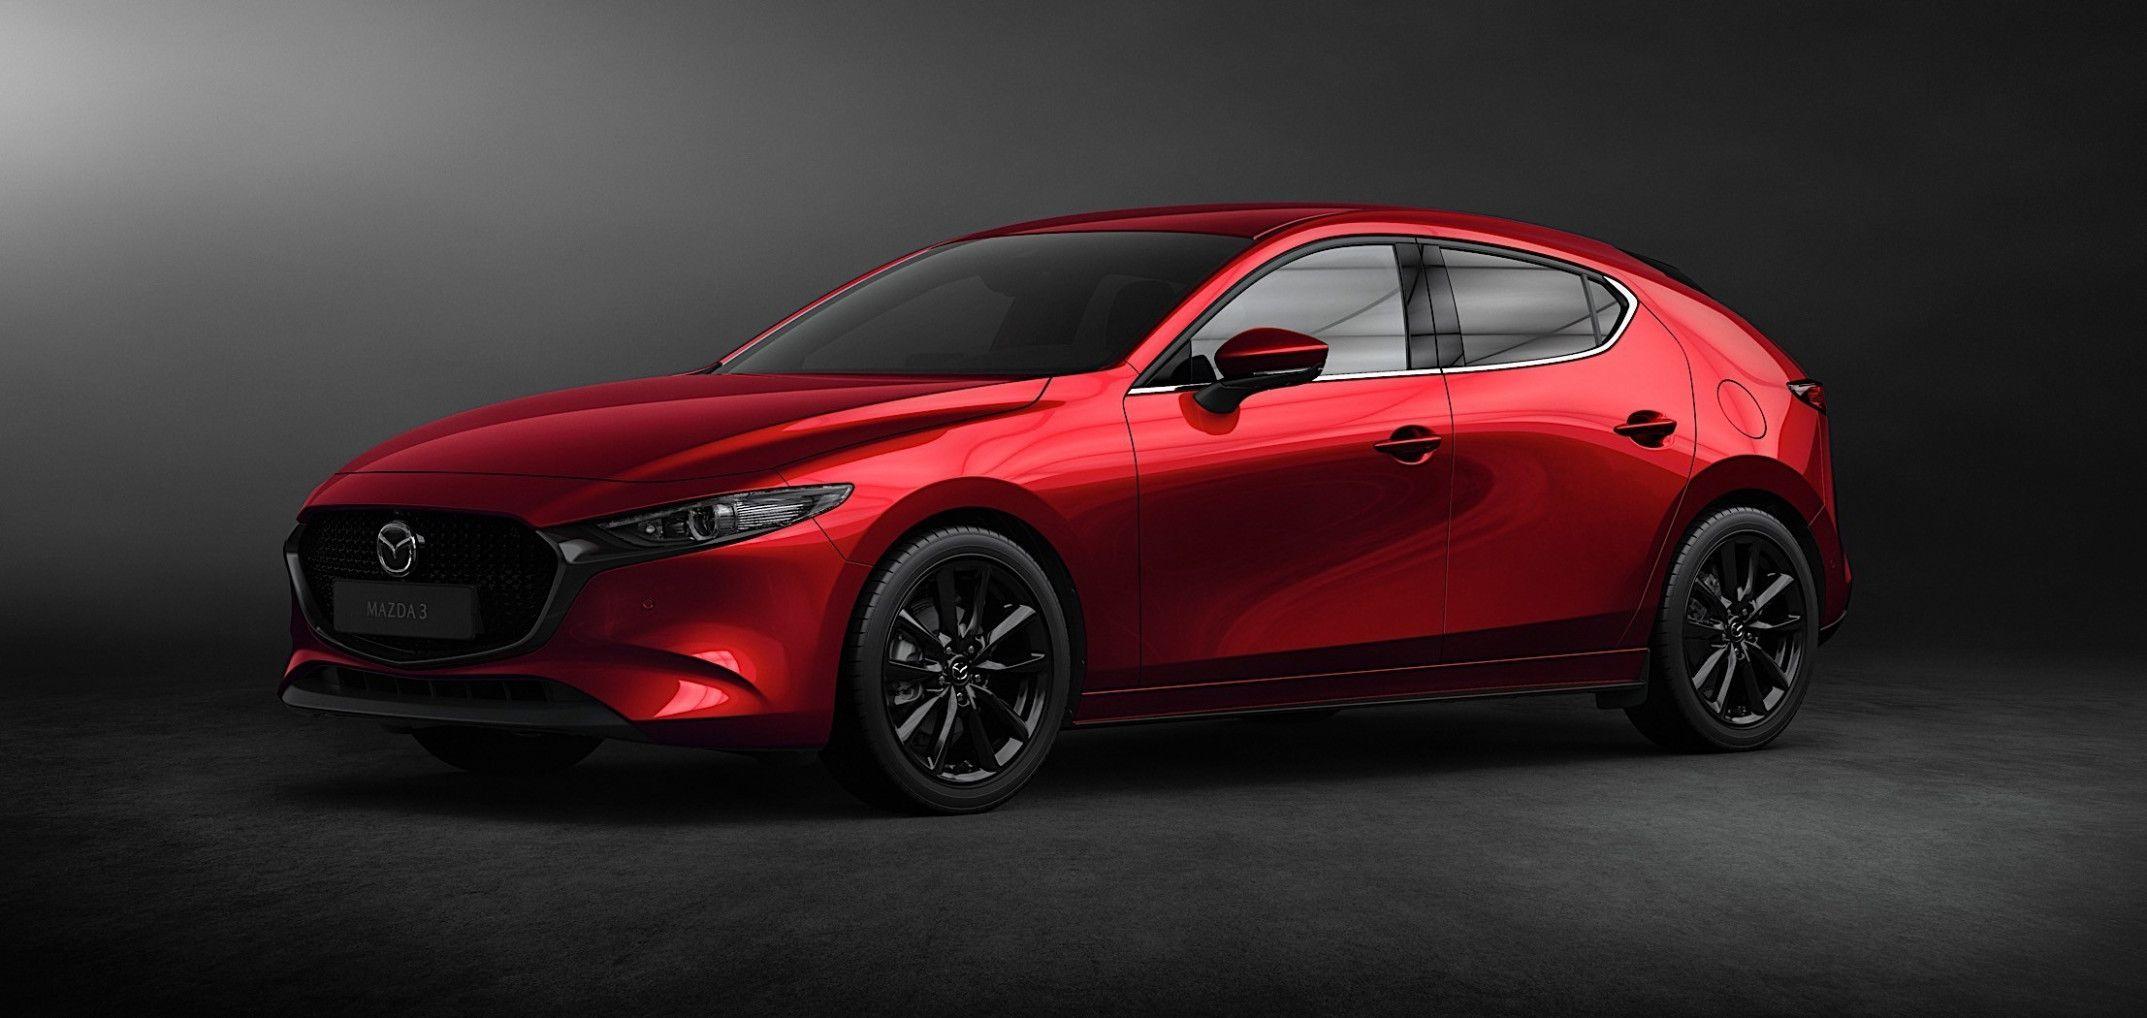 2020 Mazda Mazda3 Engine